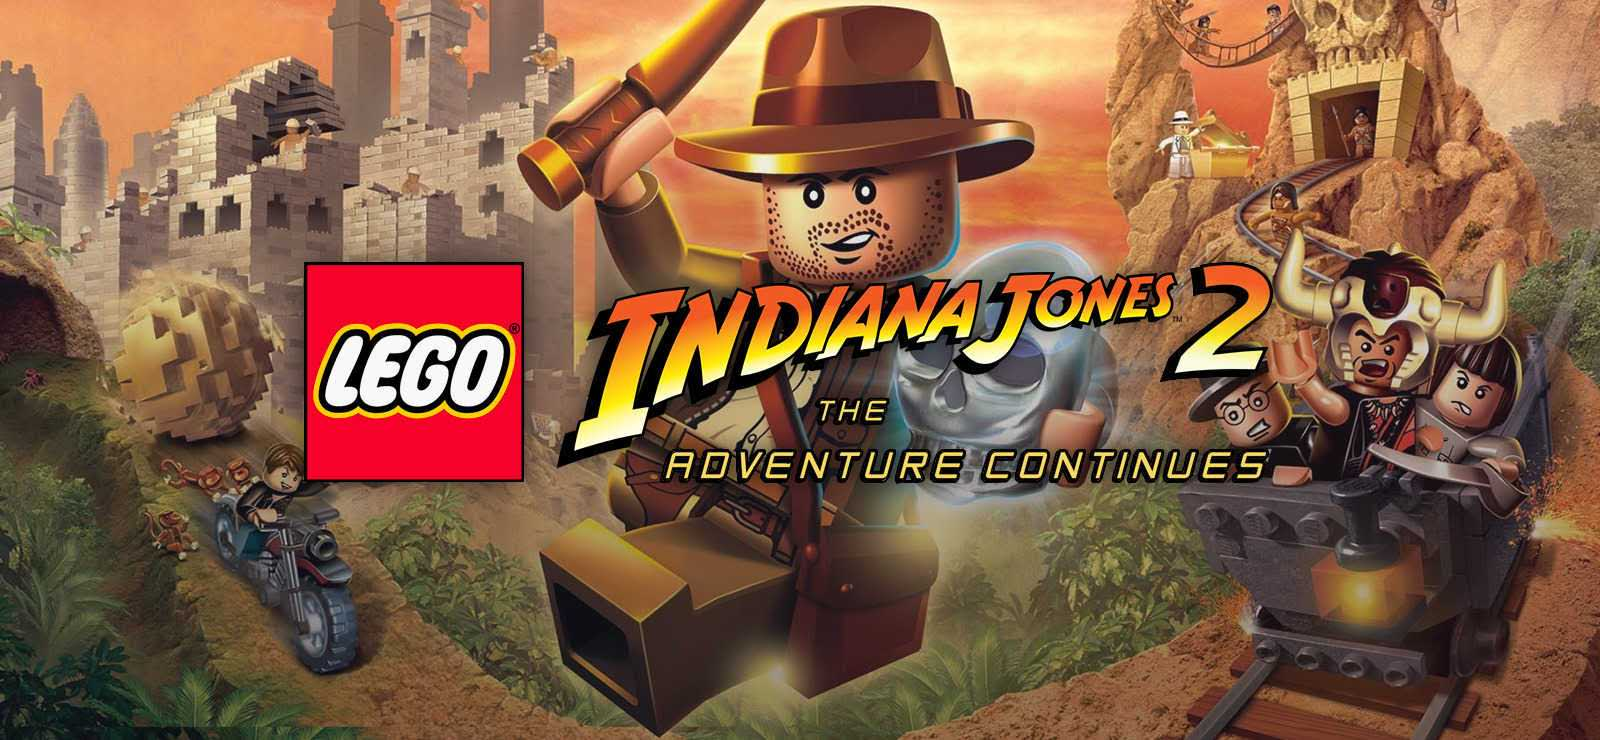 lego-indiana-jones-2-the-adventure-continues